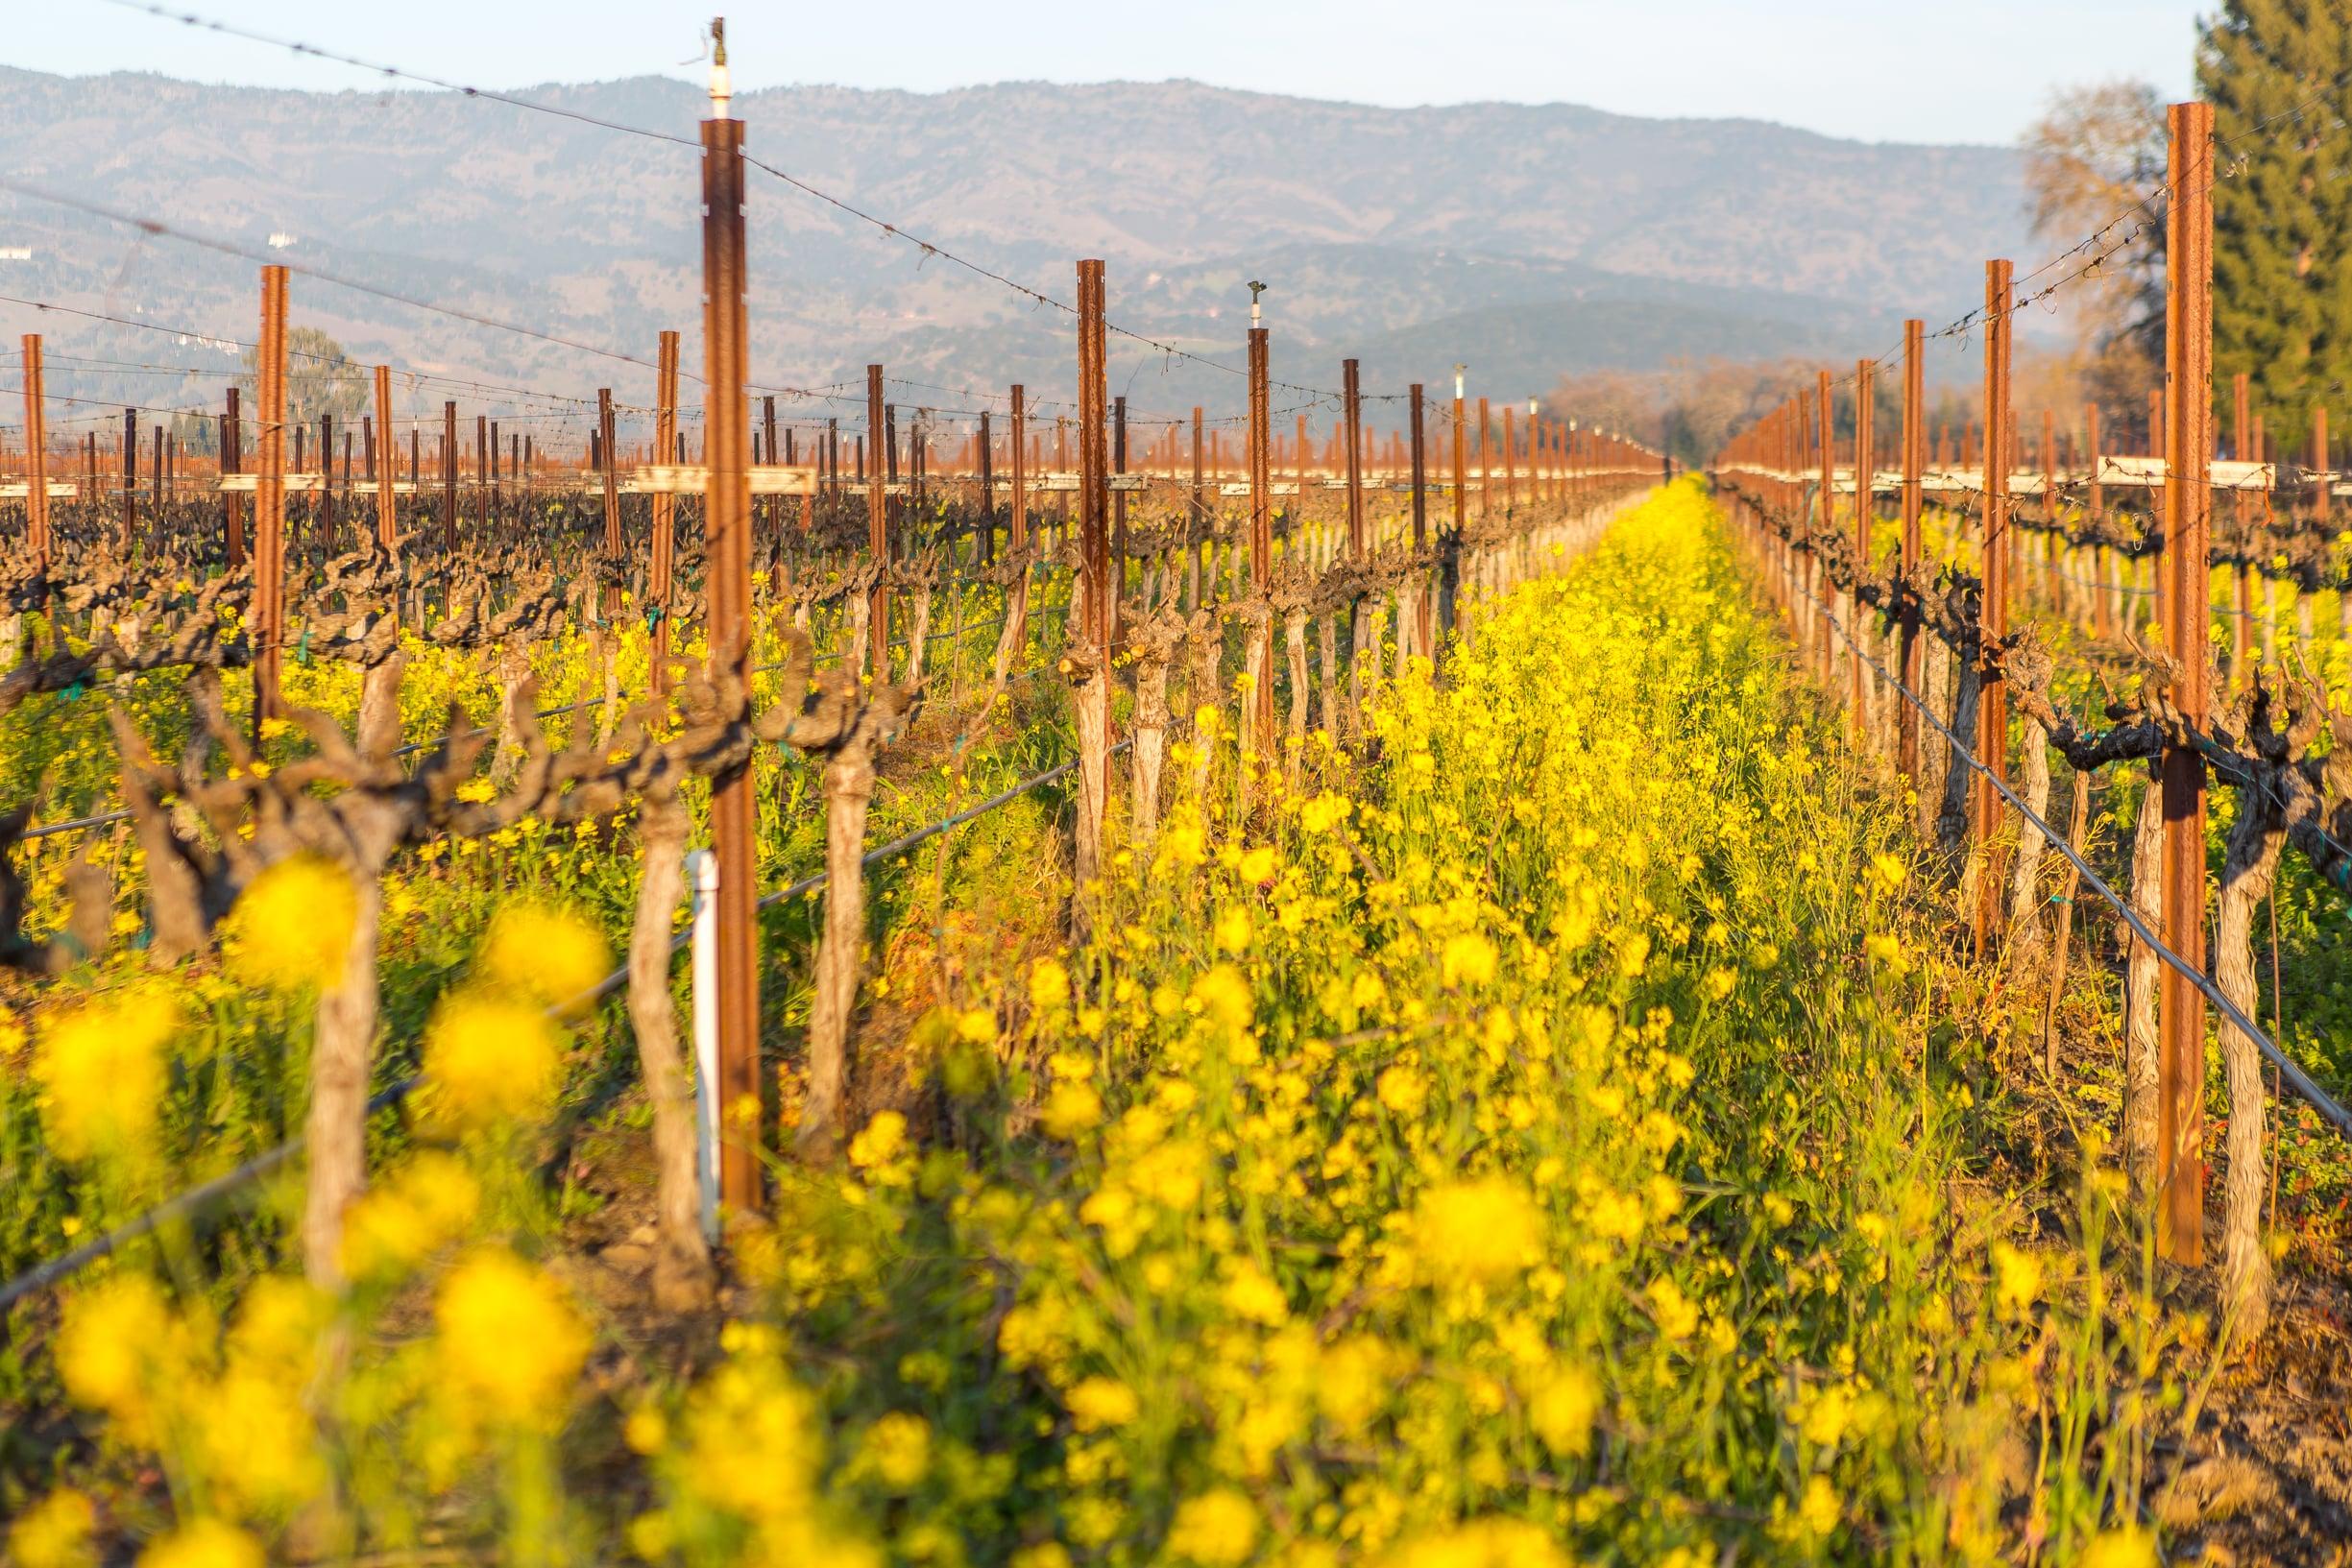 VineyardMustard2015-38.jpg